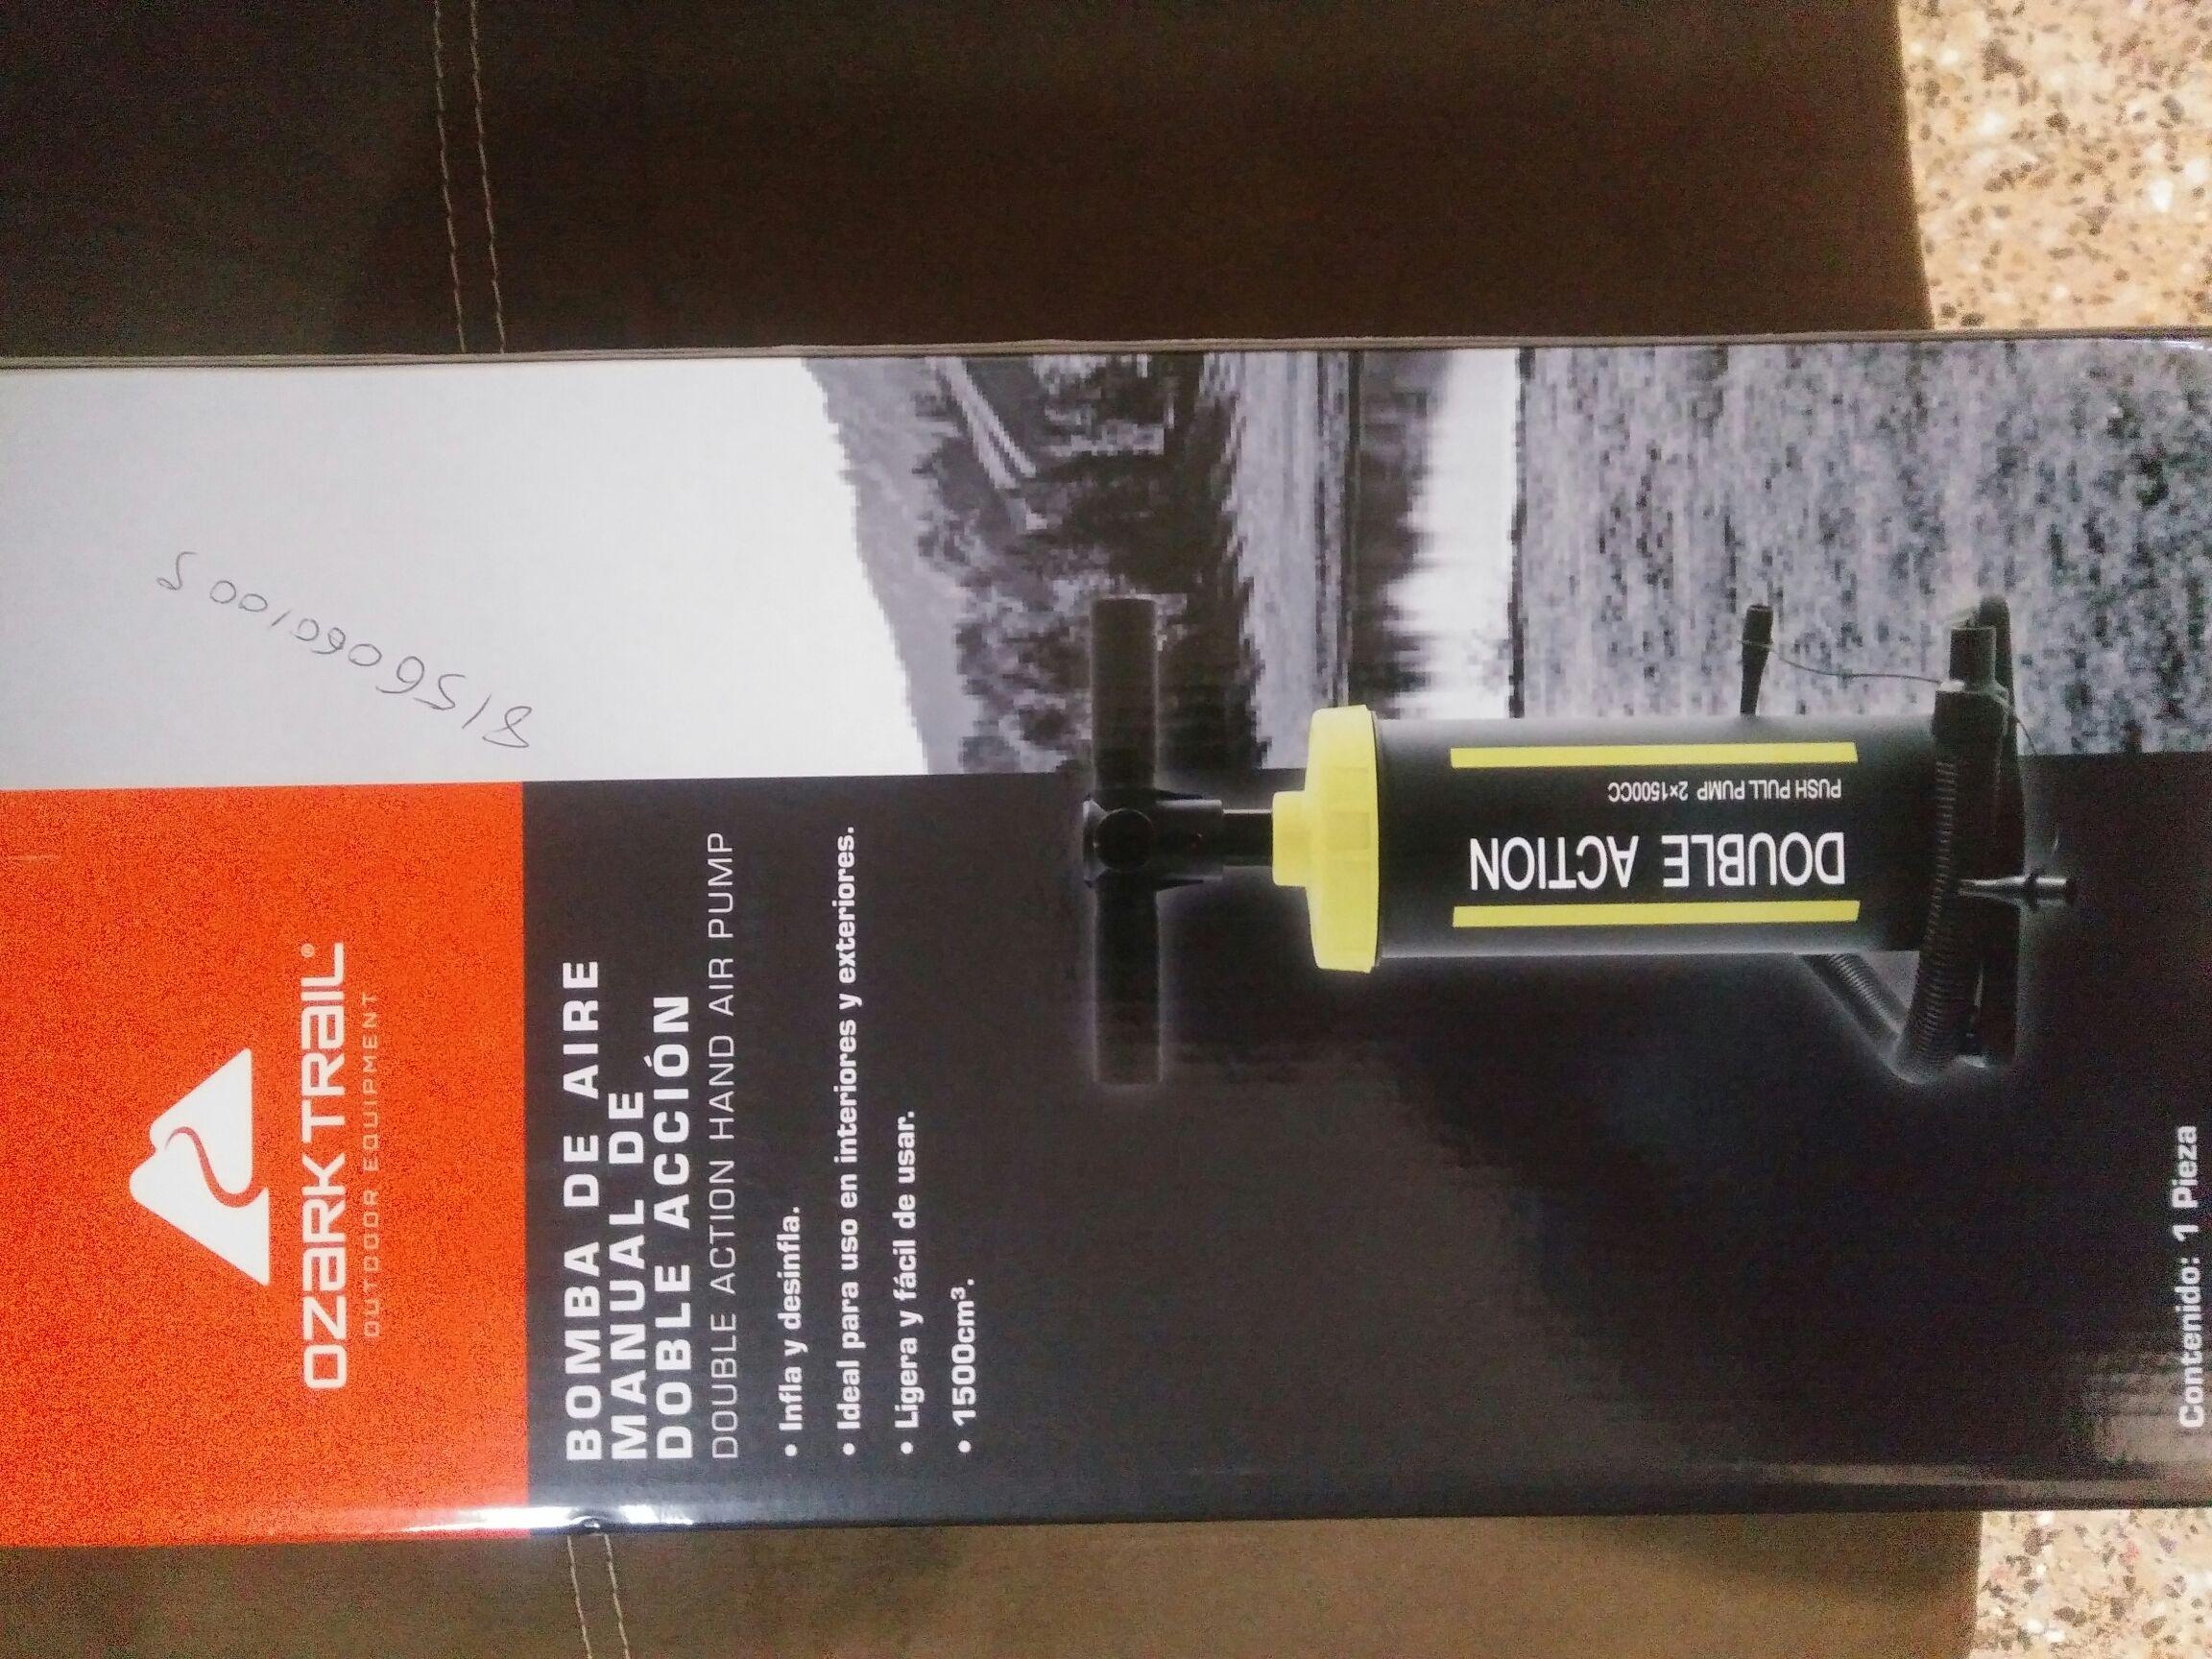 Bodega Aurrerá: Bomba de aire manual Ozark Trail Mas promorelato a $19.01